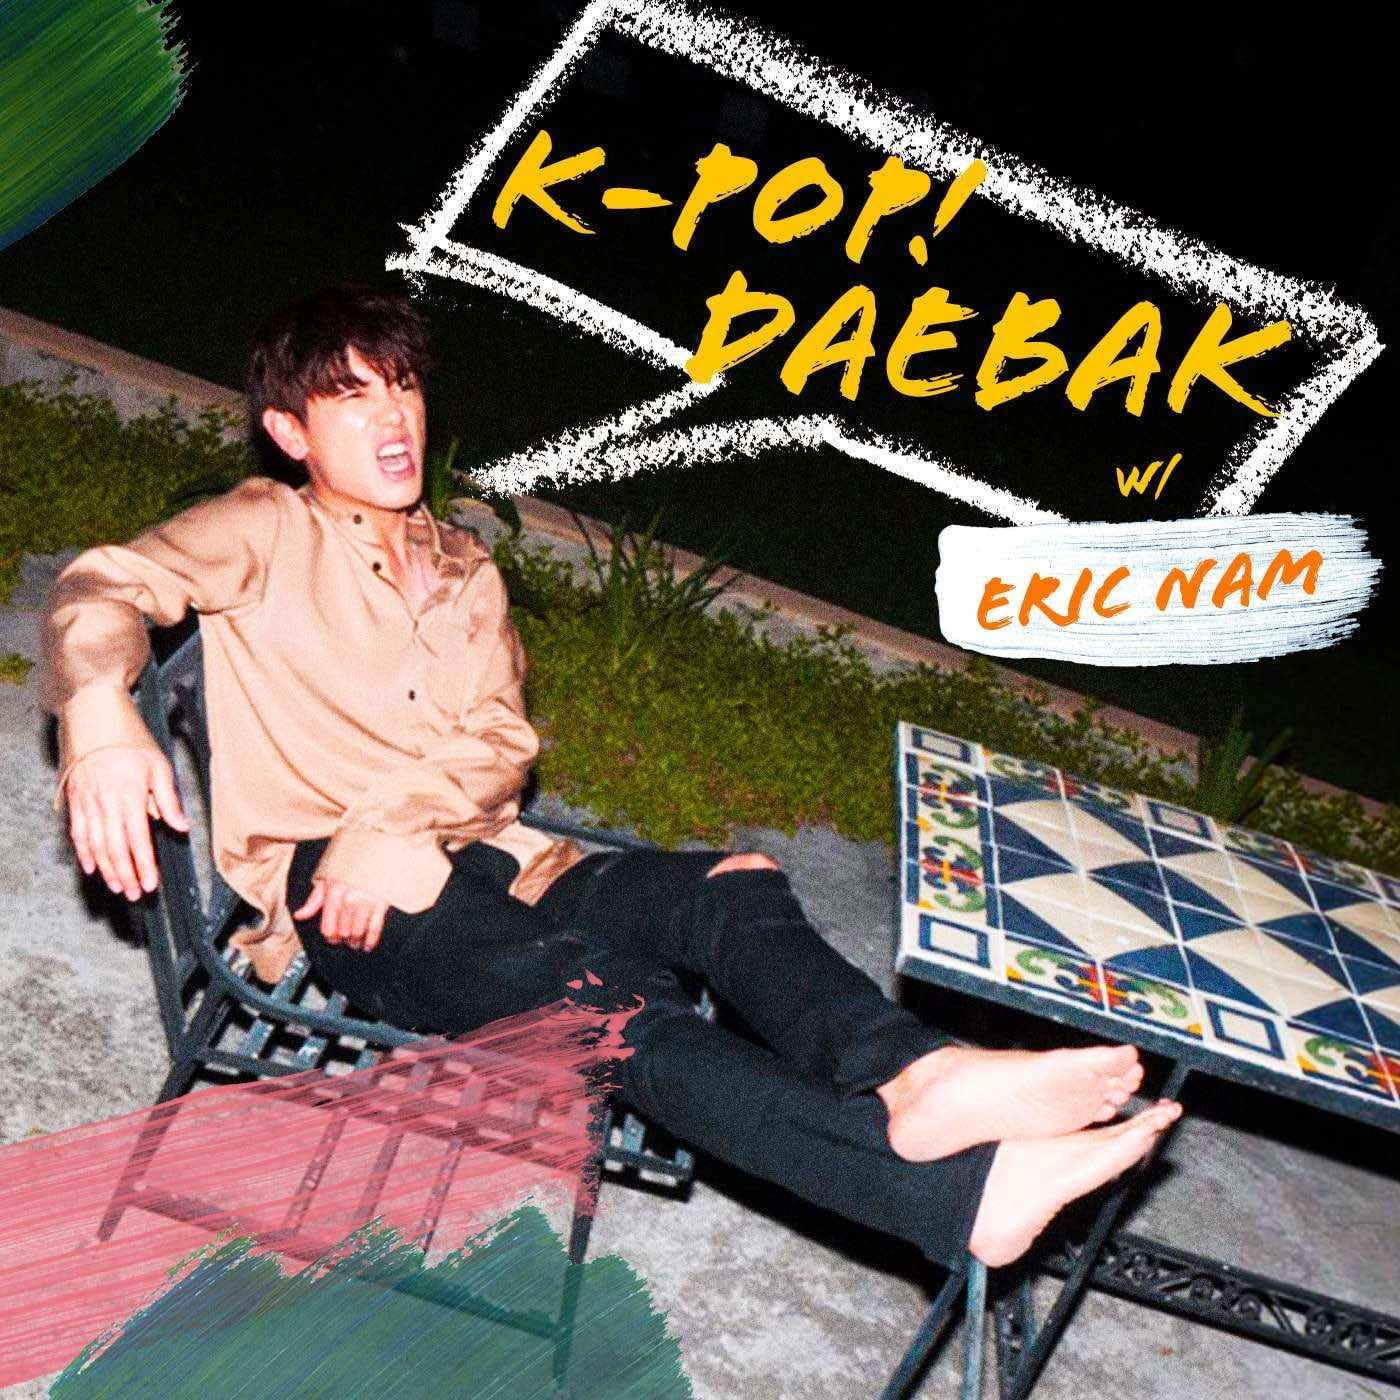 K-Pop Daebak w/ Eric Nam   Podbay